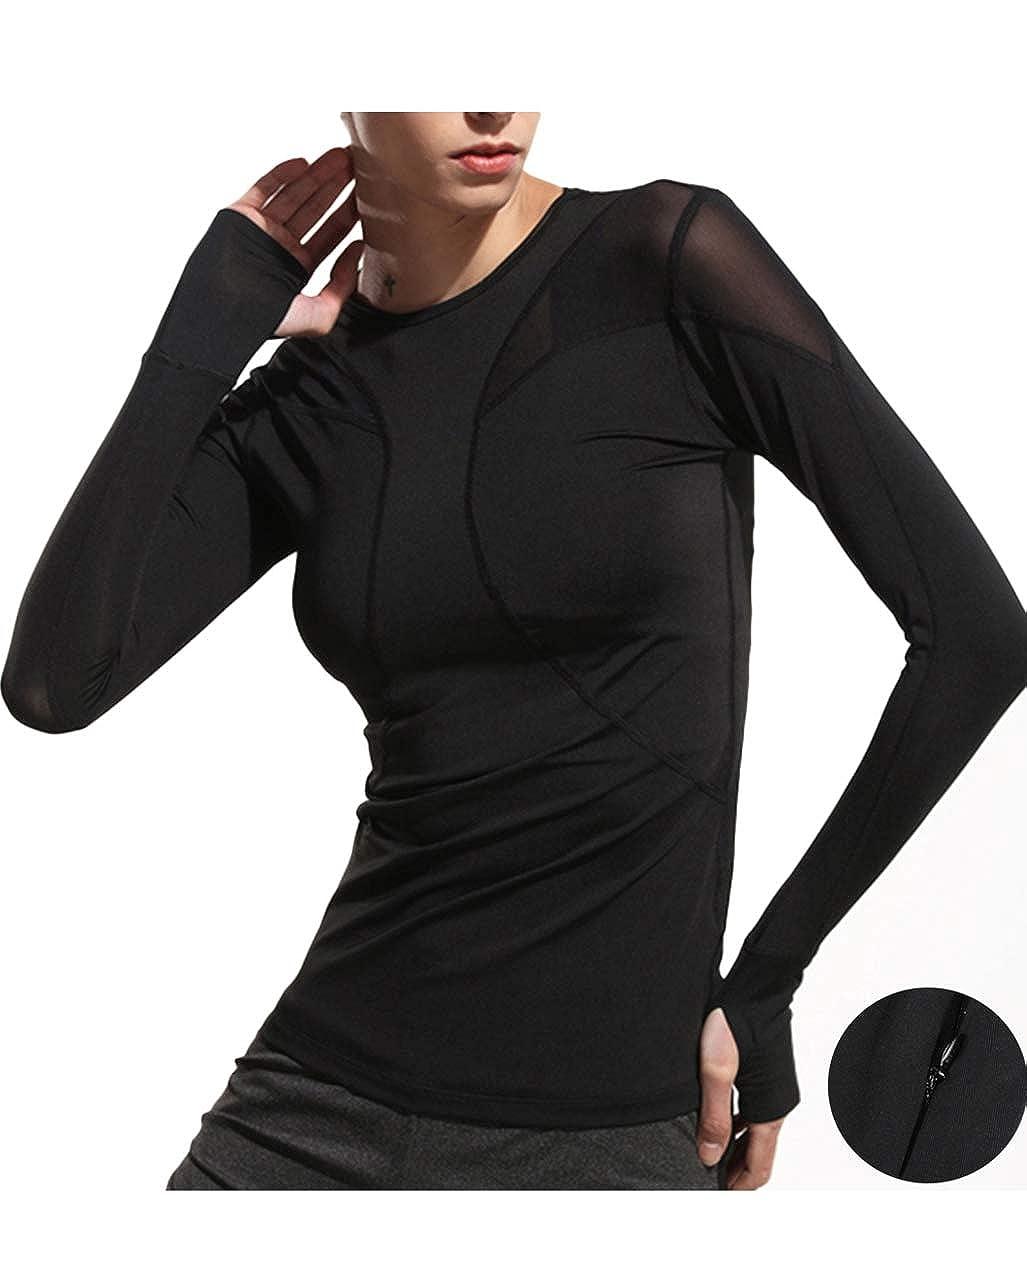 721a01cfa56b5 Amazon.com  UDIY Women s Long Sleeve Active Running T-Shirt with Thumb  Hole  Clothing